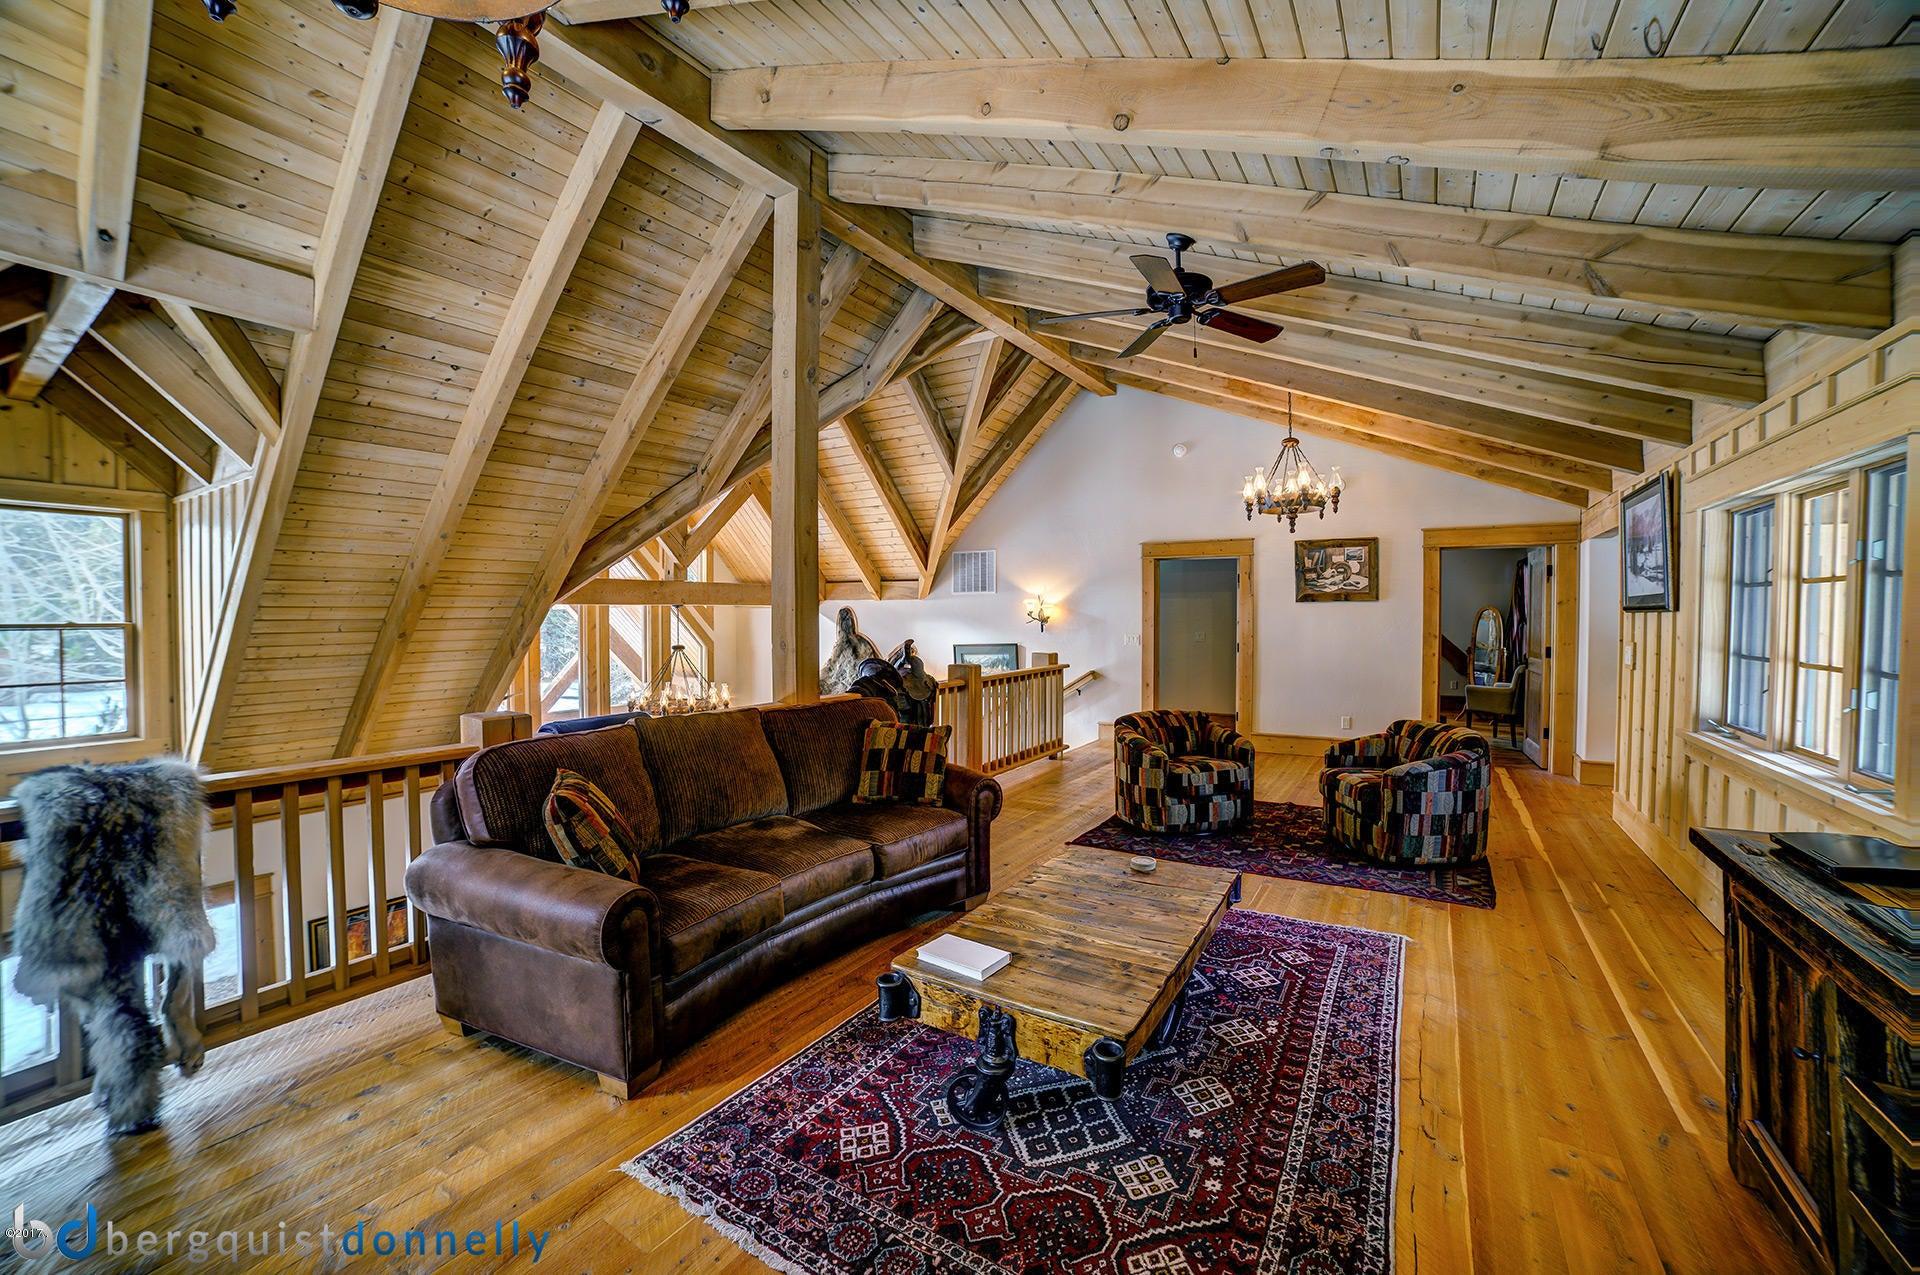 Additional photo for property listing at Timber Ridge Drive Timber Ridge Drive Sula, Montana,59871 Estados Unidos